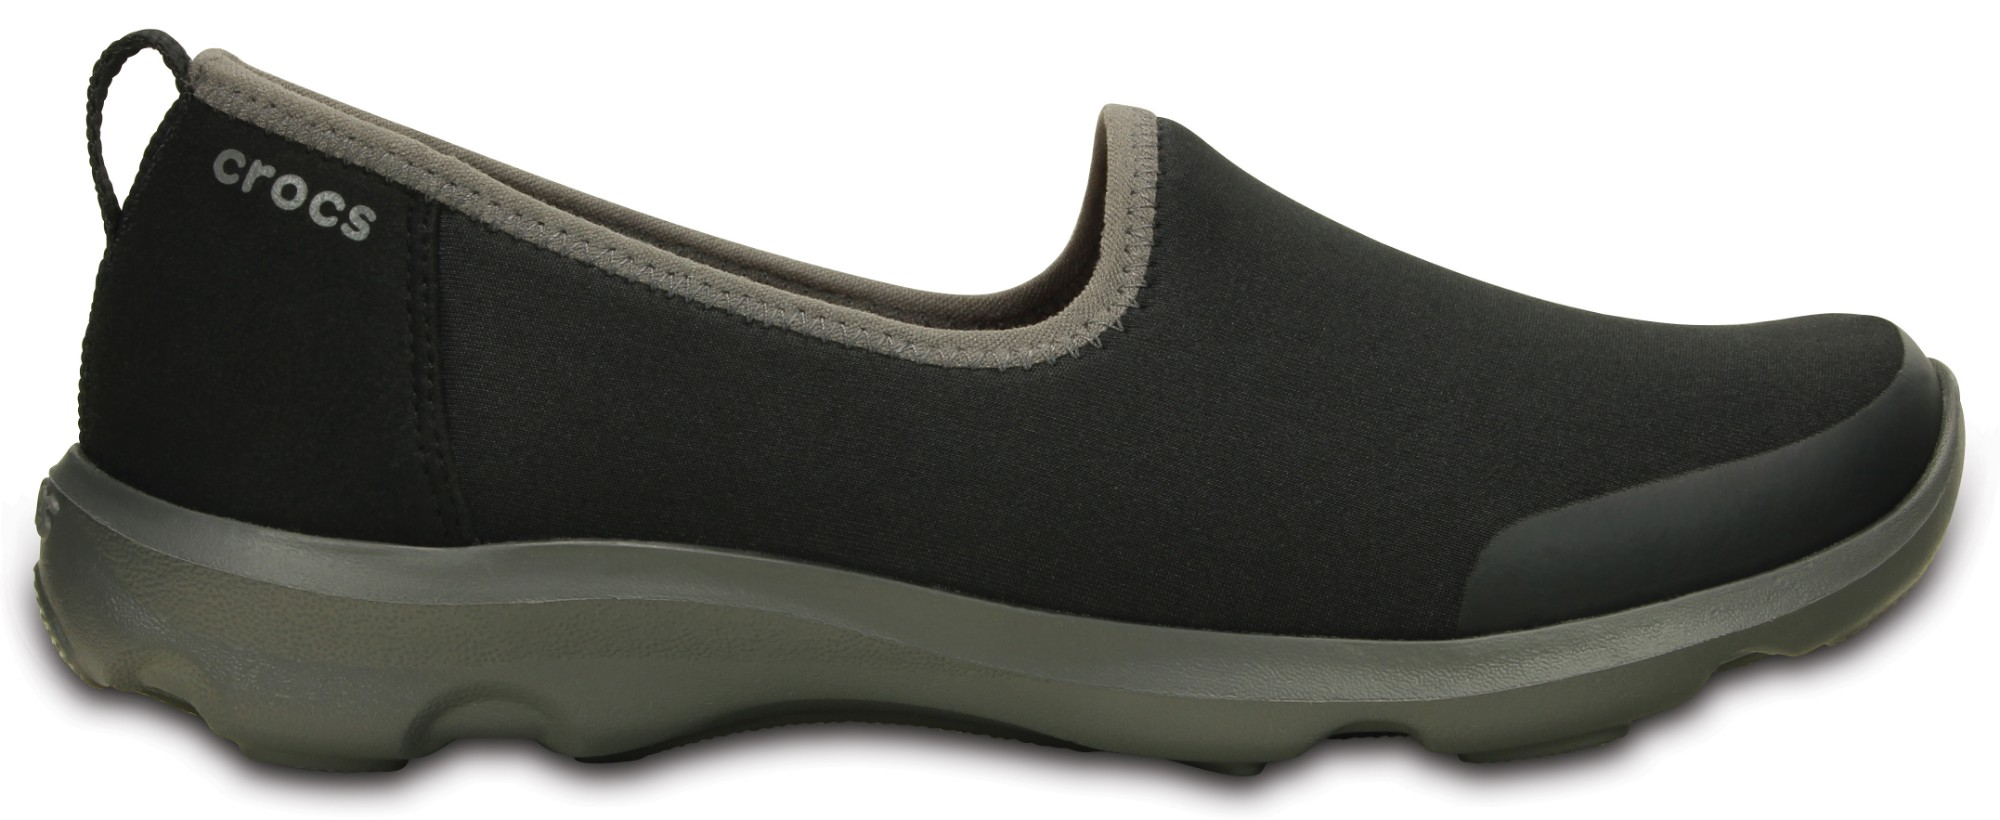 Crocs™ Busy Day Stretch Skimmer Black/Graphite 36,5